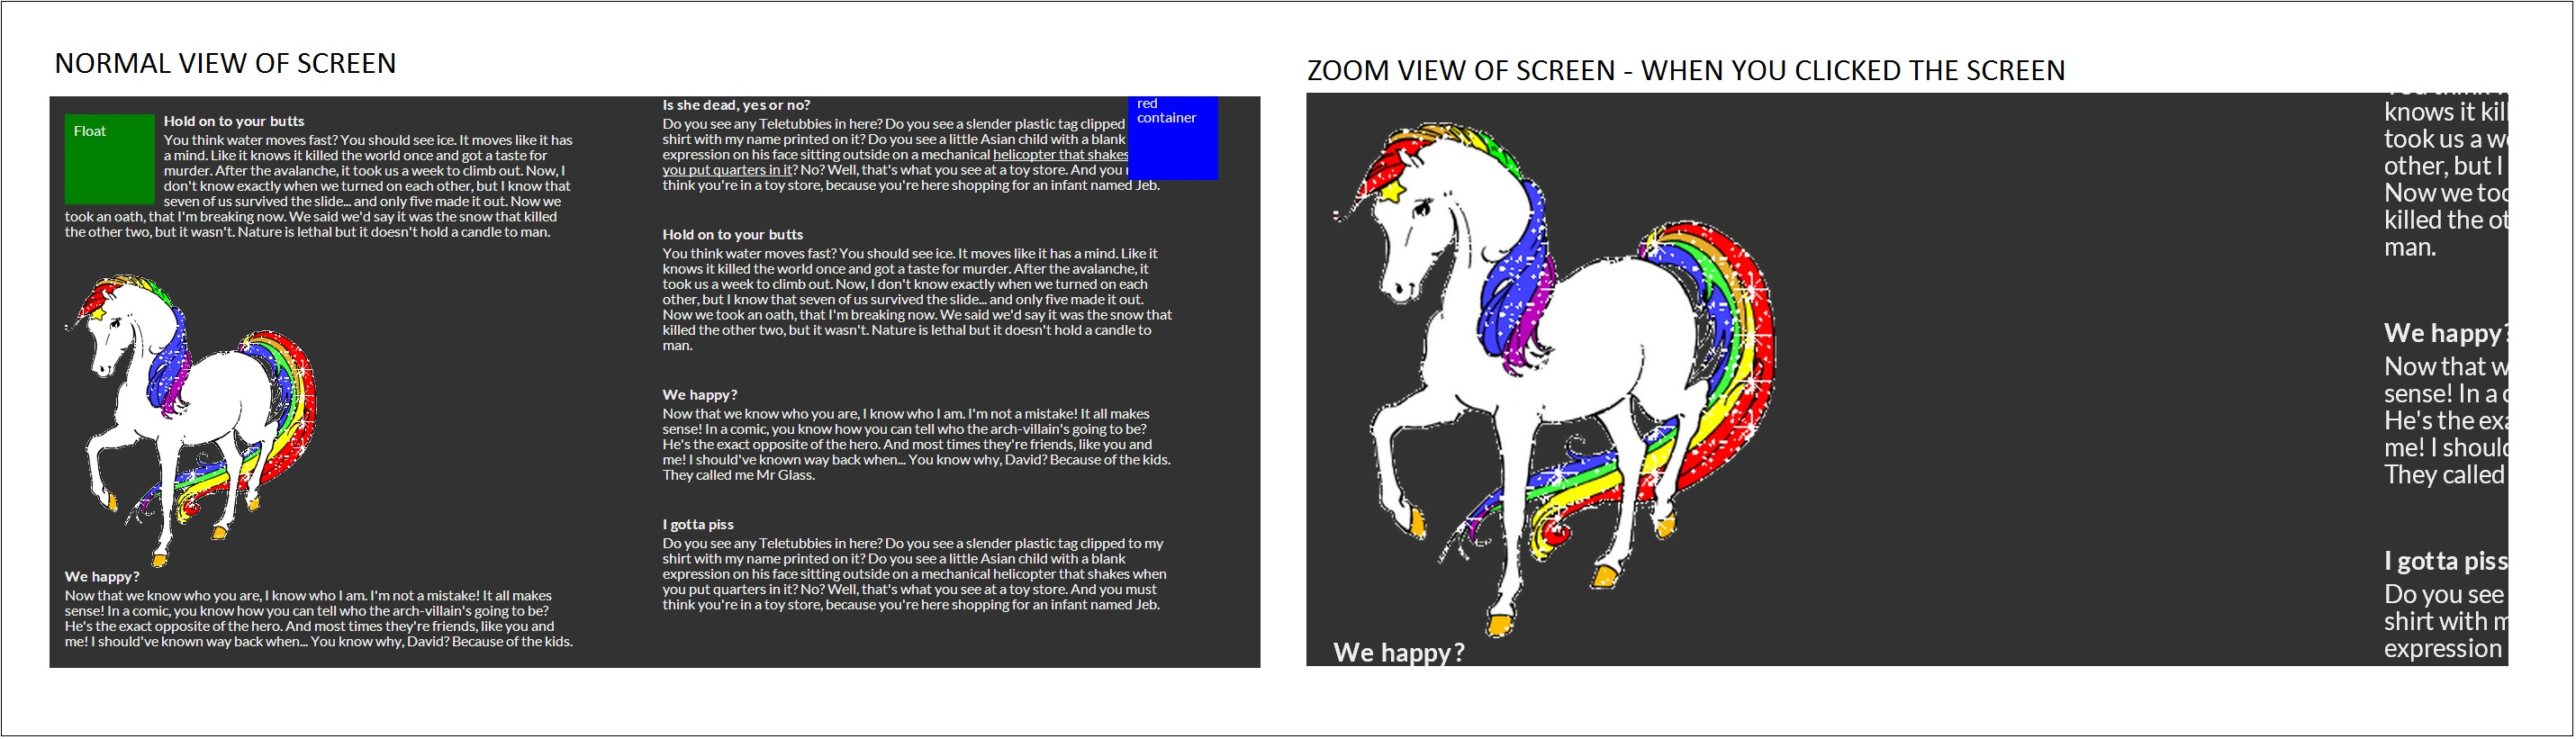 zoomjs